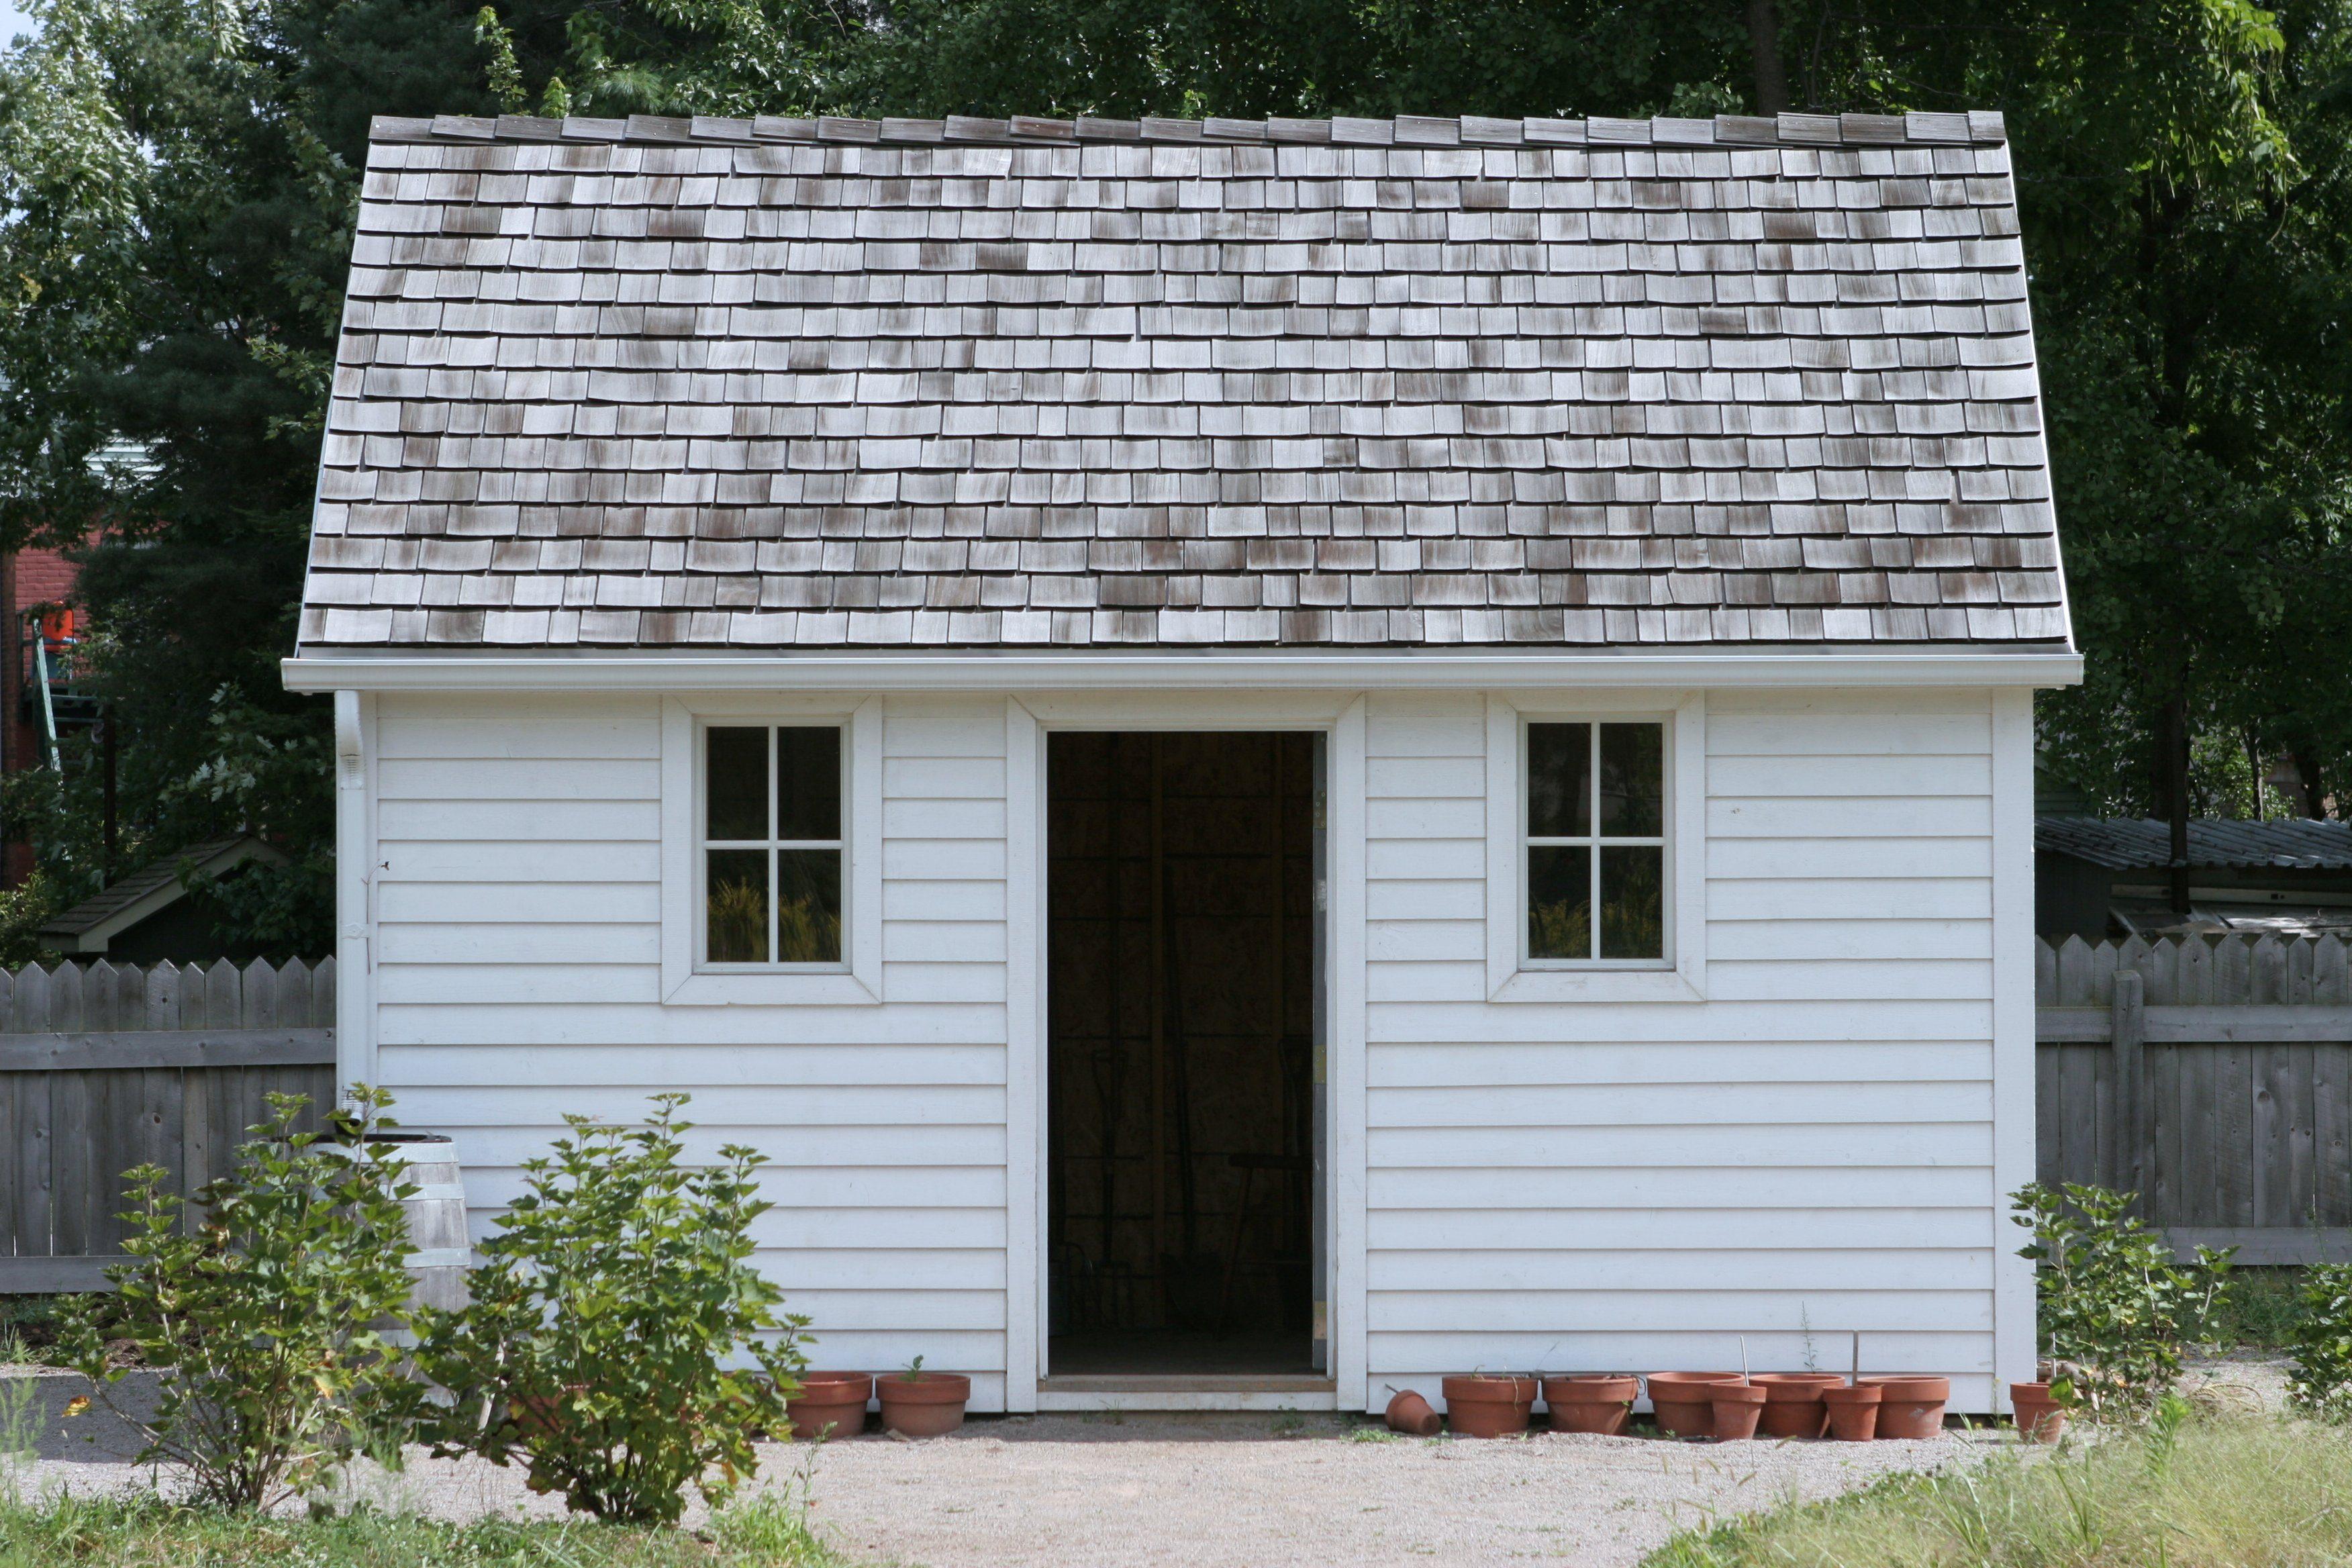 Small white house; Shutterstock ID 1741867; Job (TFH, TOH, RD, BNB, CWM, CM): RD